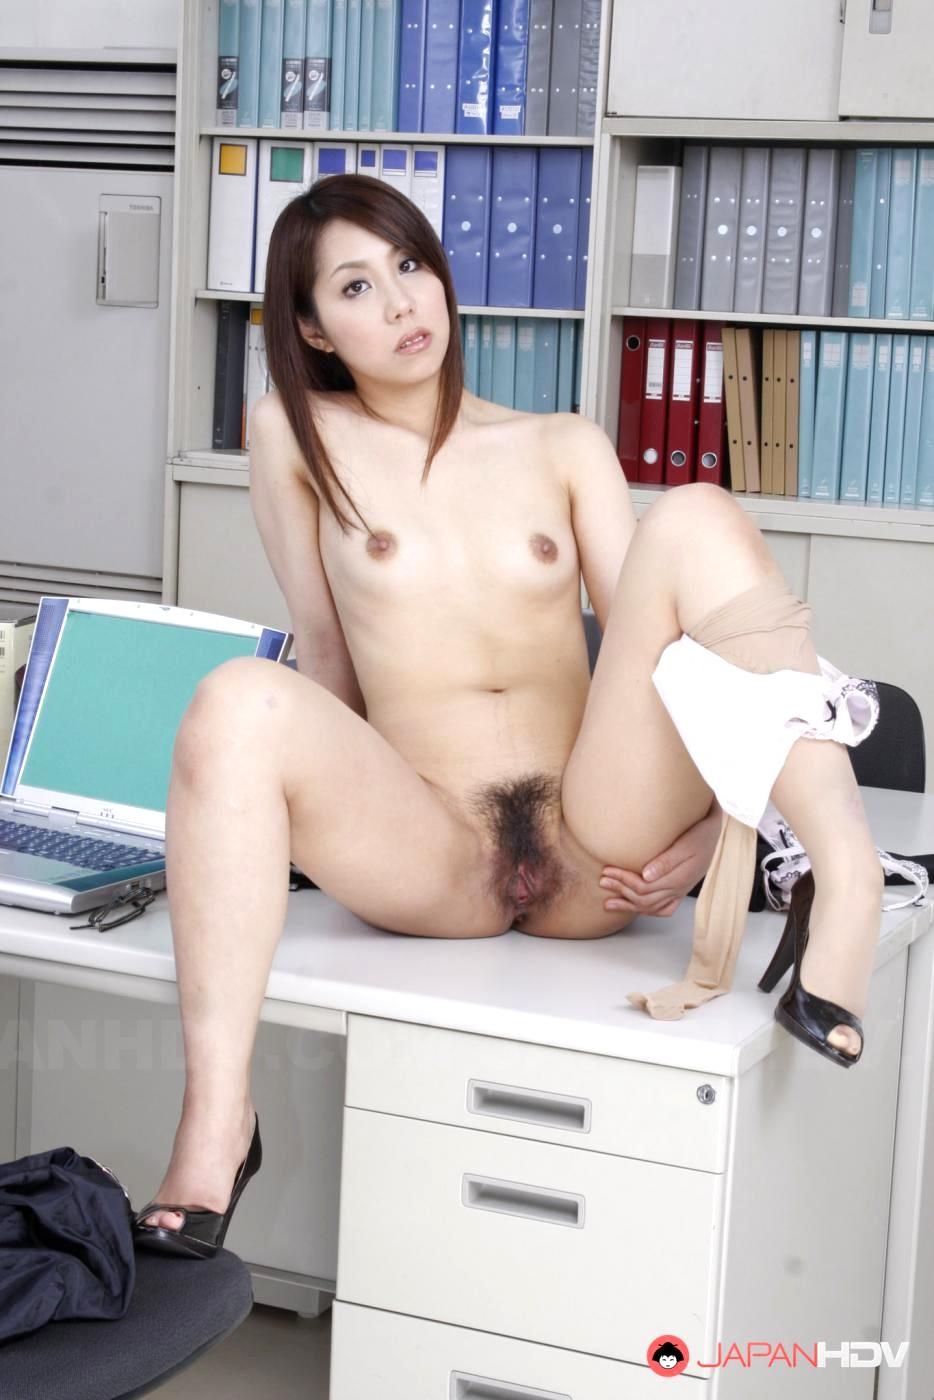 Babe Today Japan Hdv Hikaru Matsu Midnight Uniform Porno Tube Porn Pics-6402